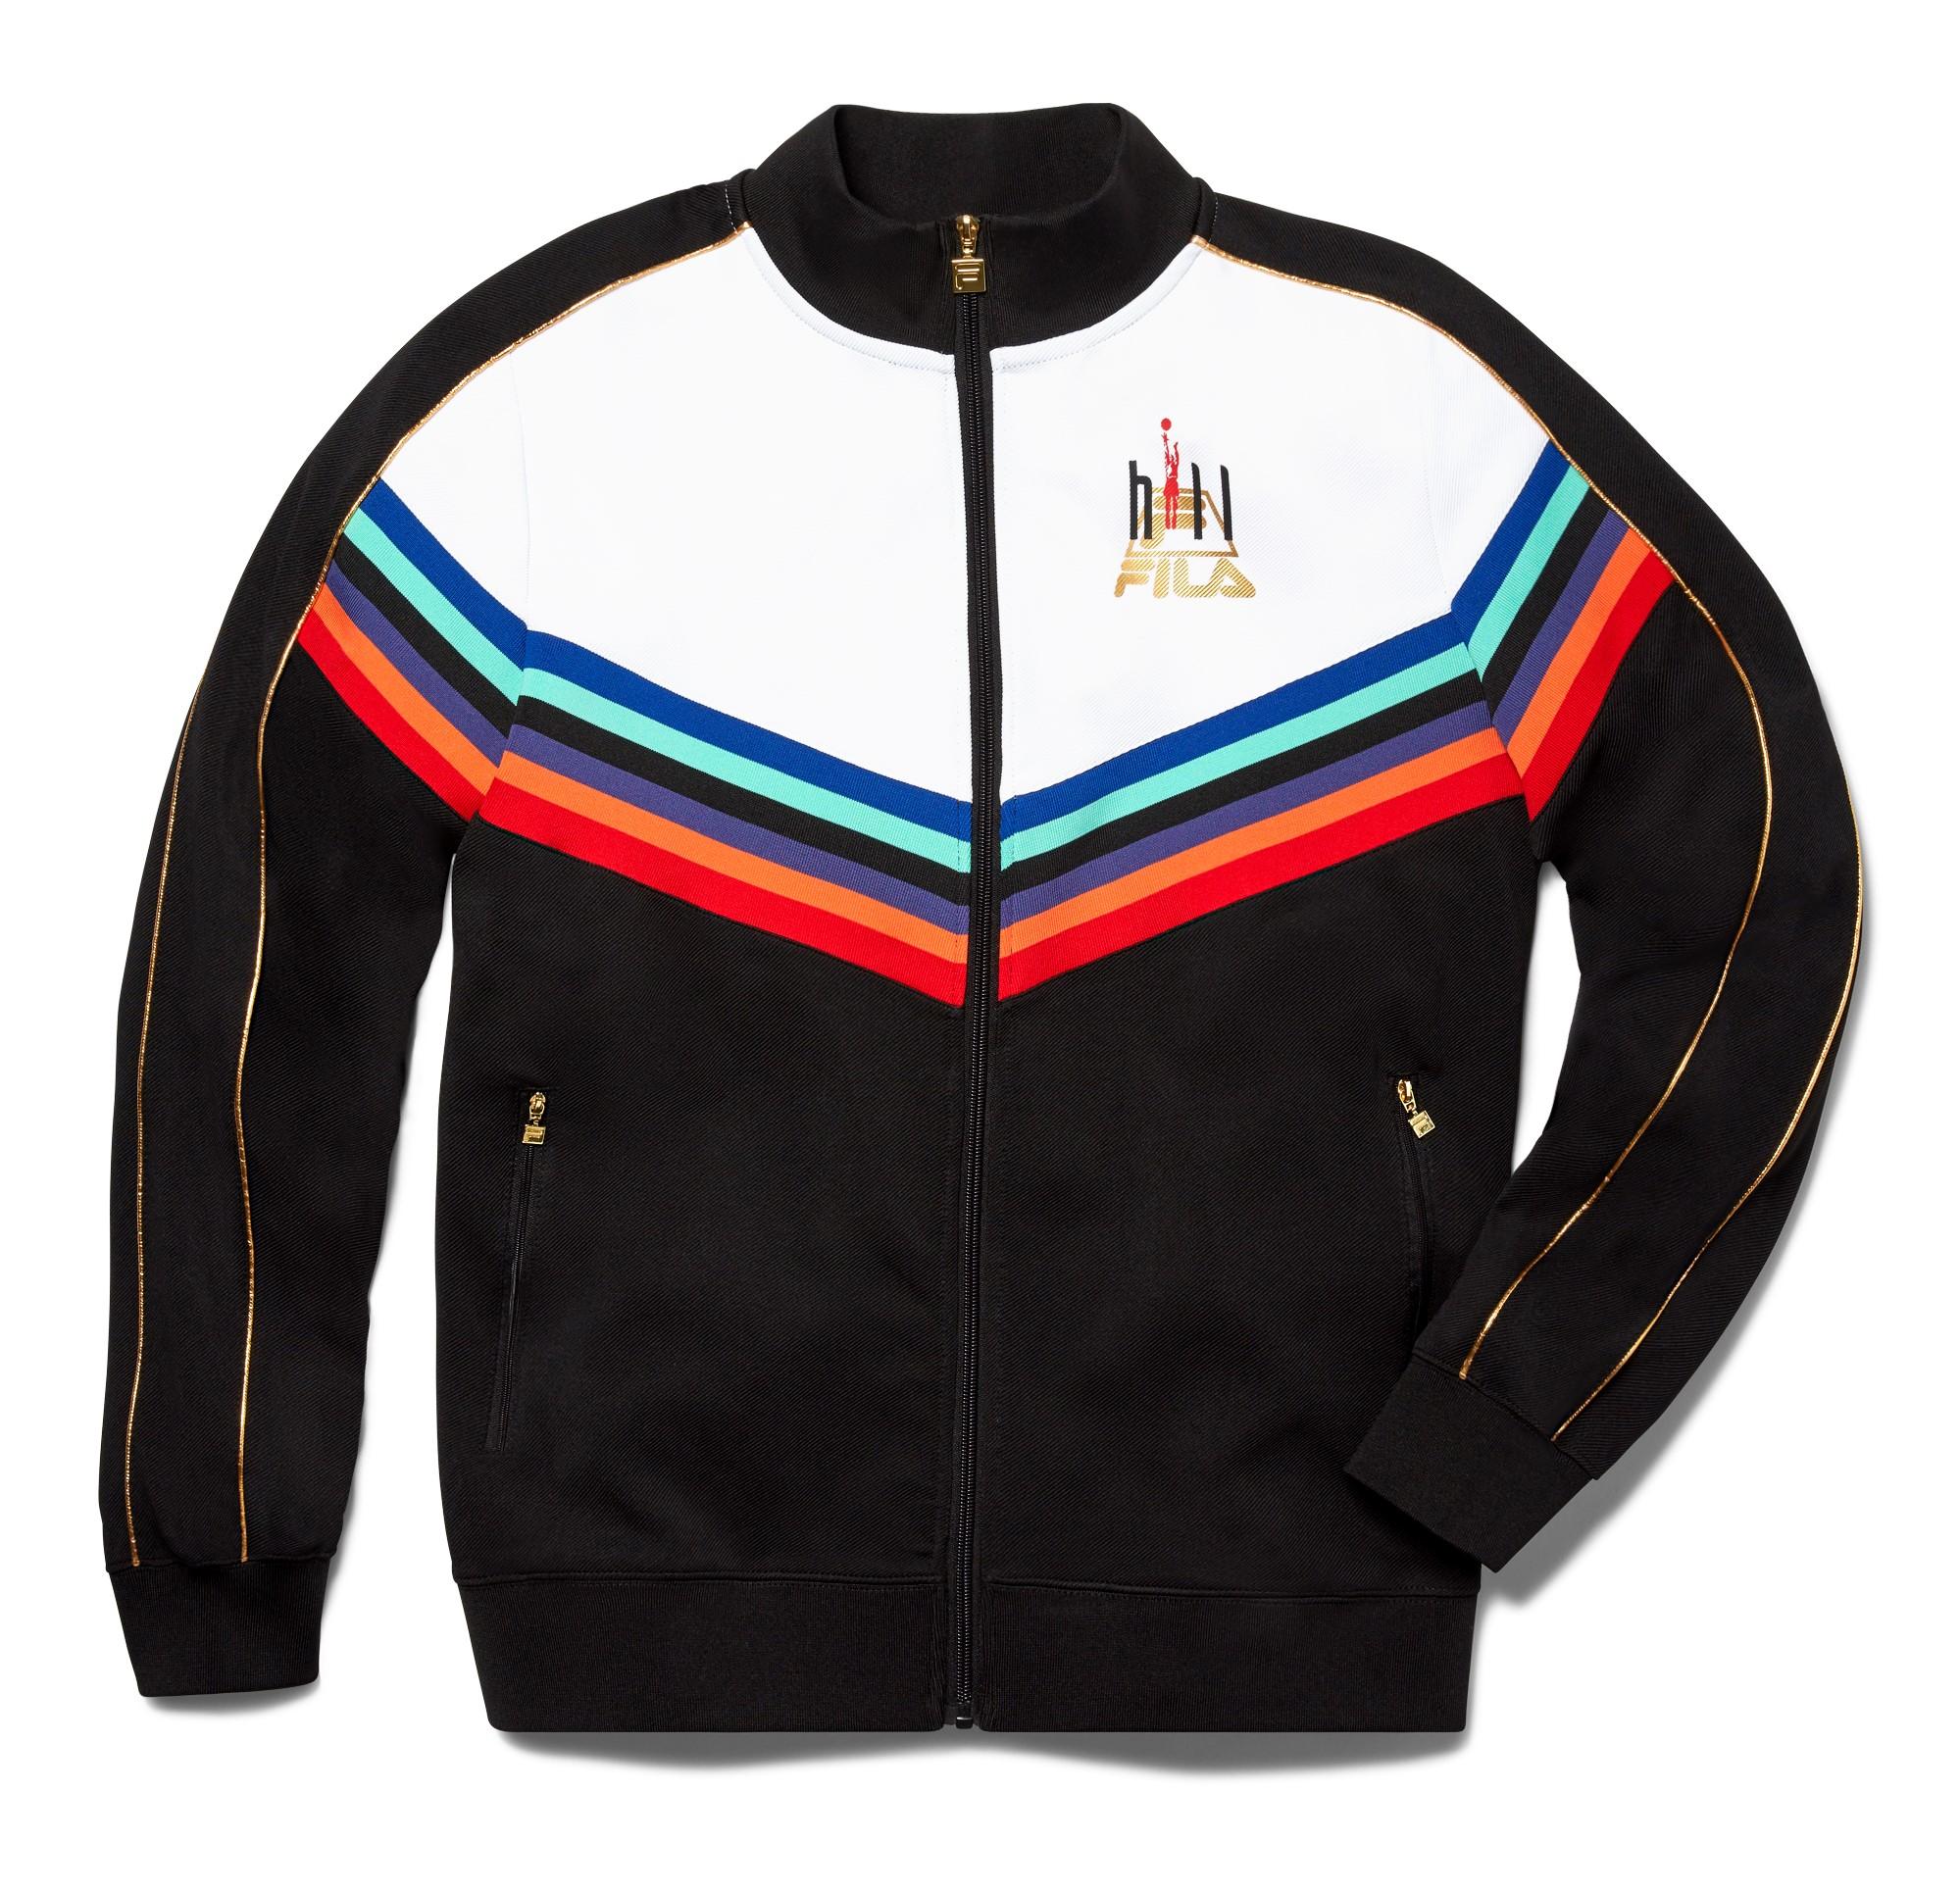 fila grant hill prism warm up jacket